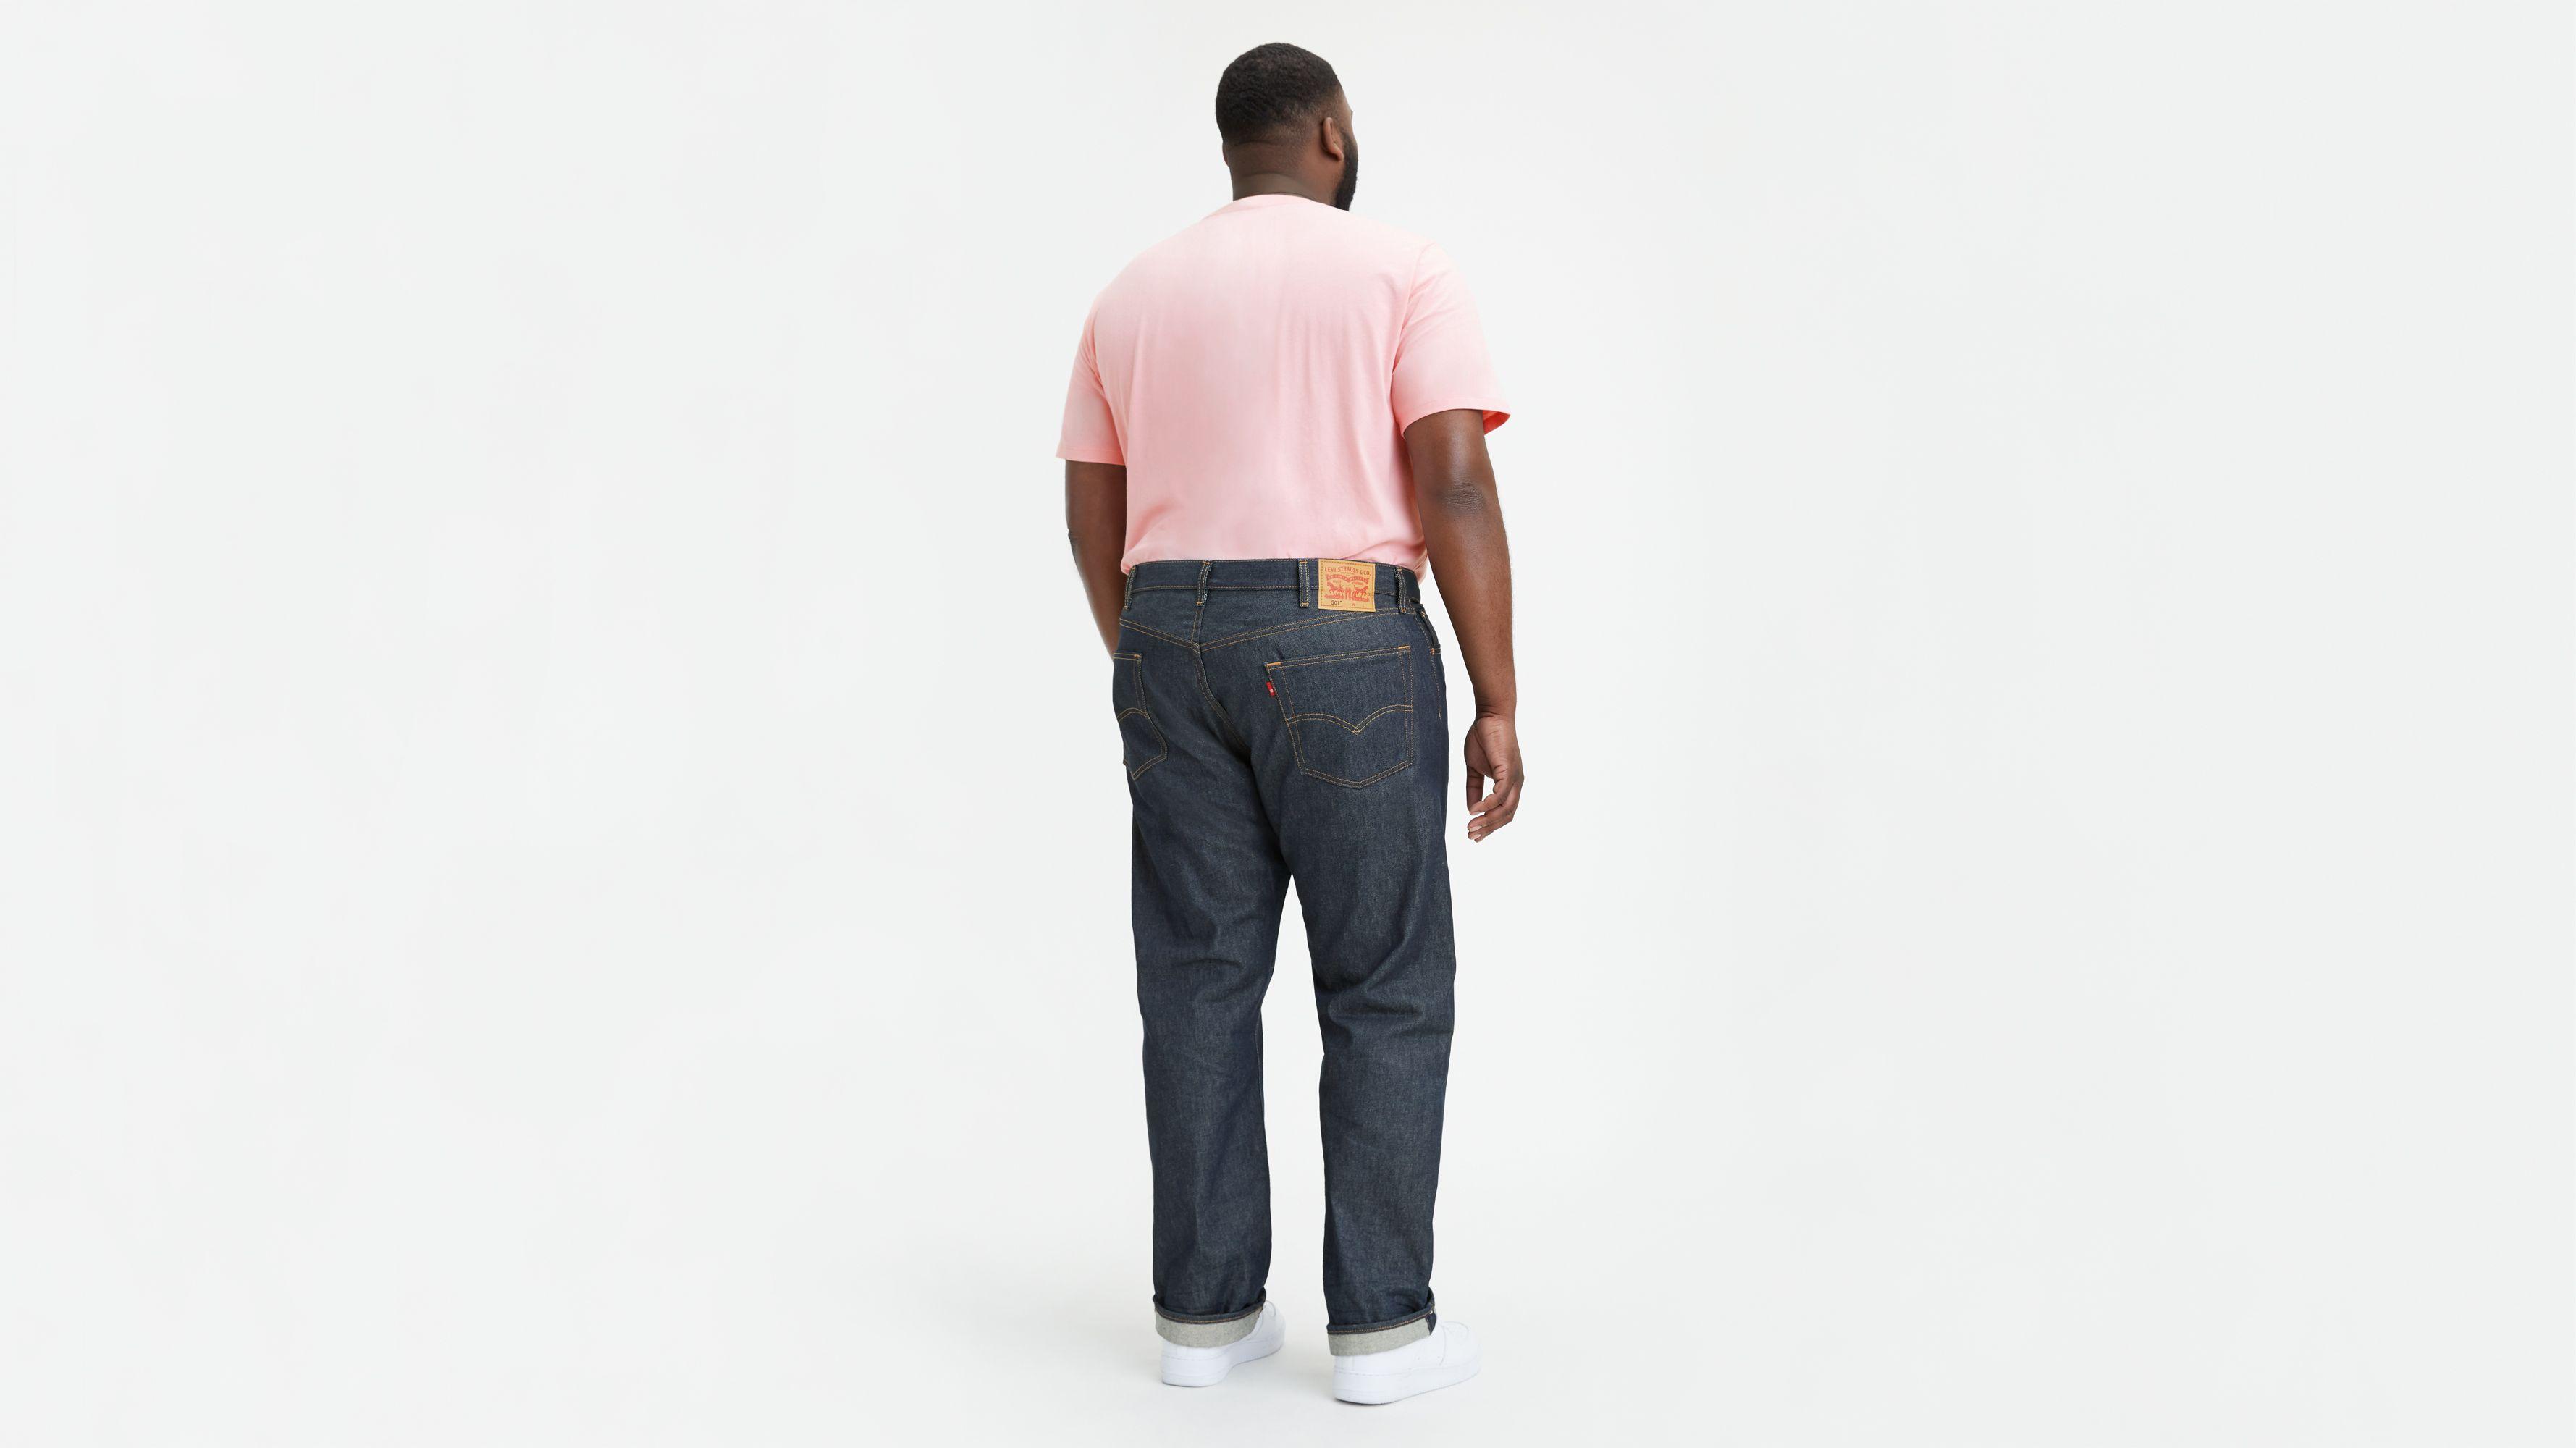 ver.Größen DIESEL PASRUL Pantaloni weiß Leinenhose 00CEHN-00NLG-100 Neu